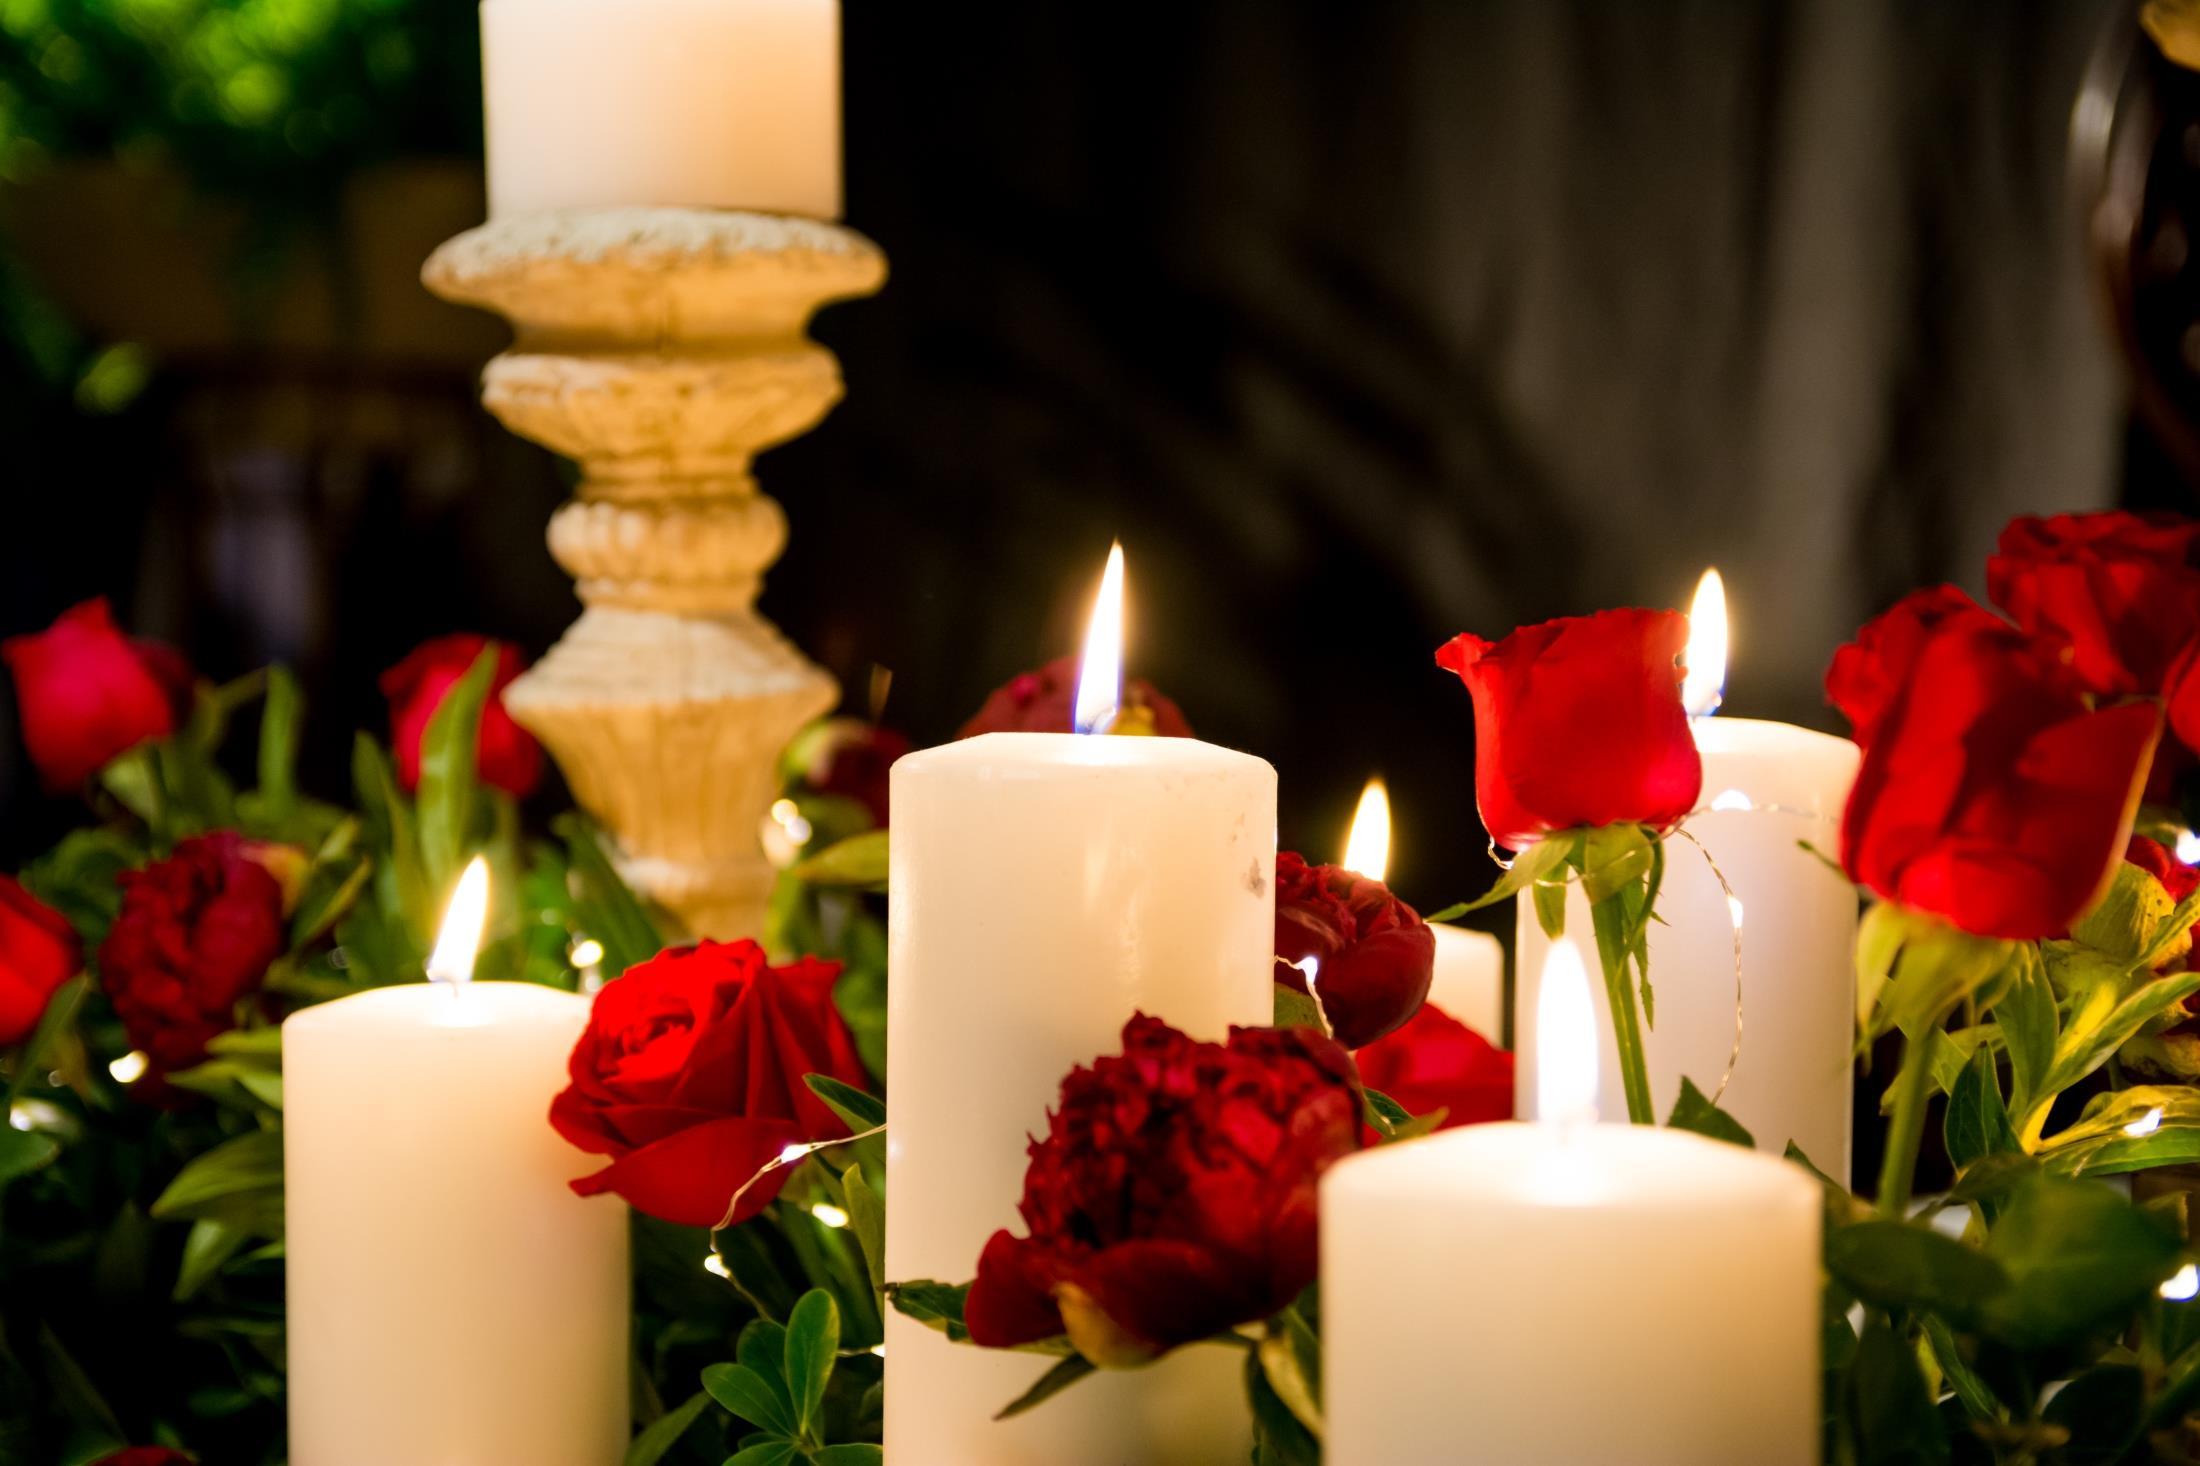 061216  -  M Sliva Navidad ph G Viramonte-5159 (Copy)